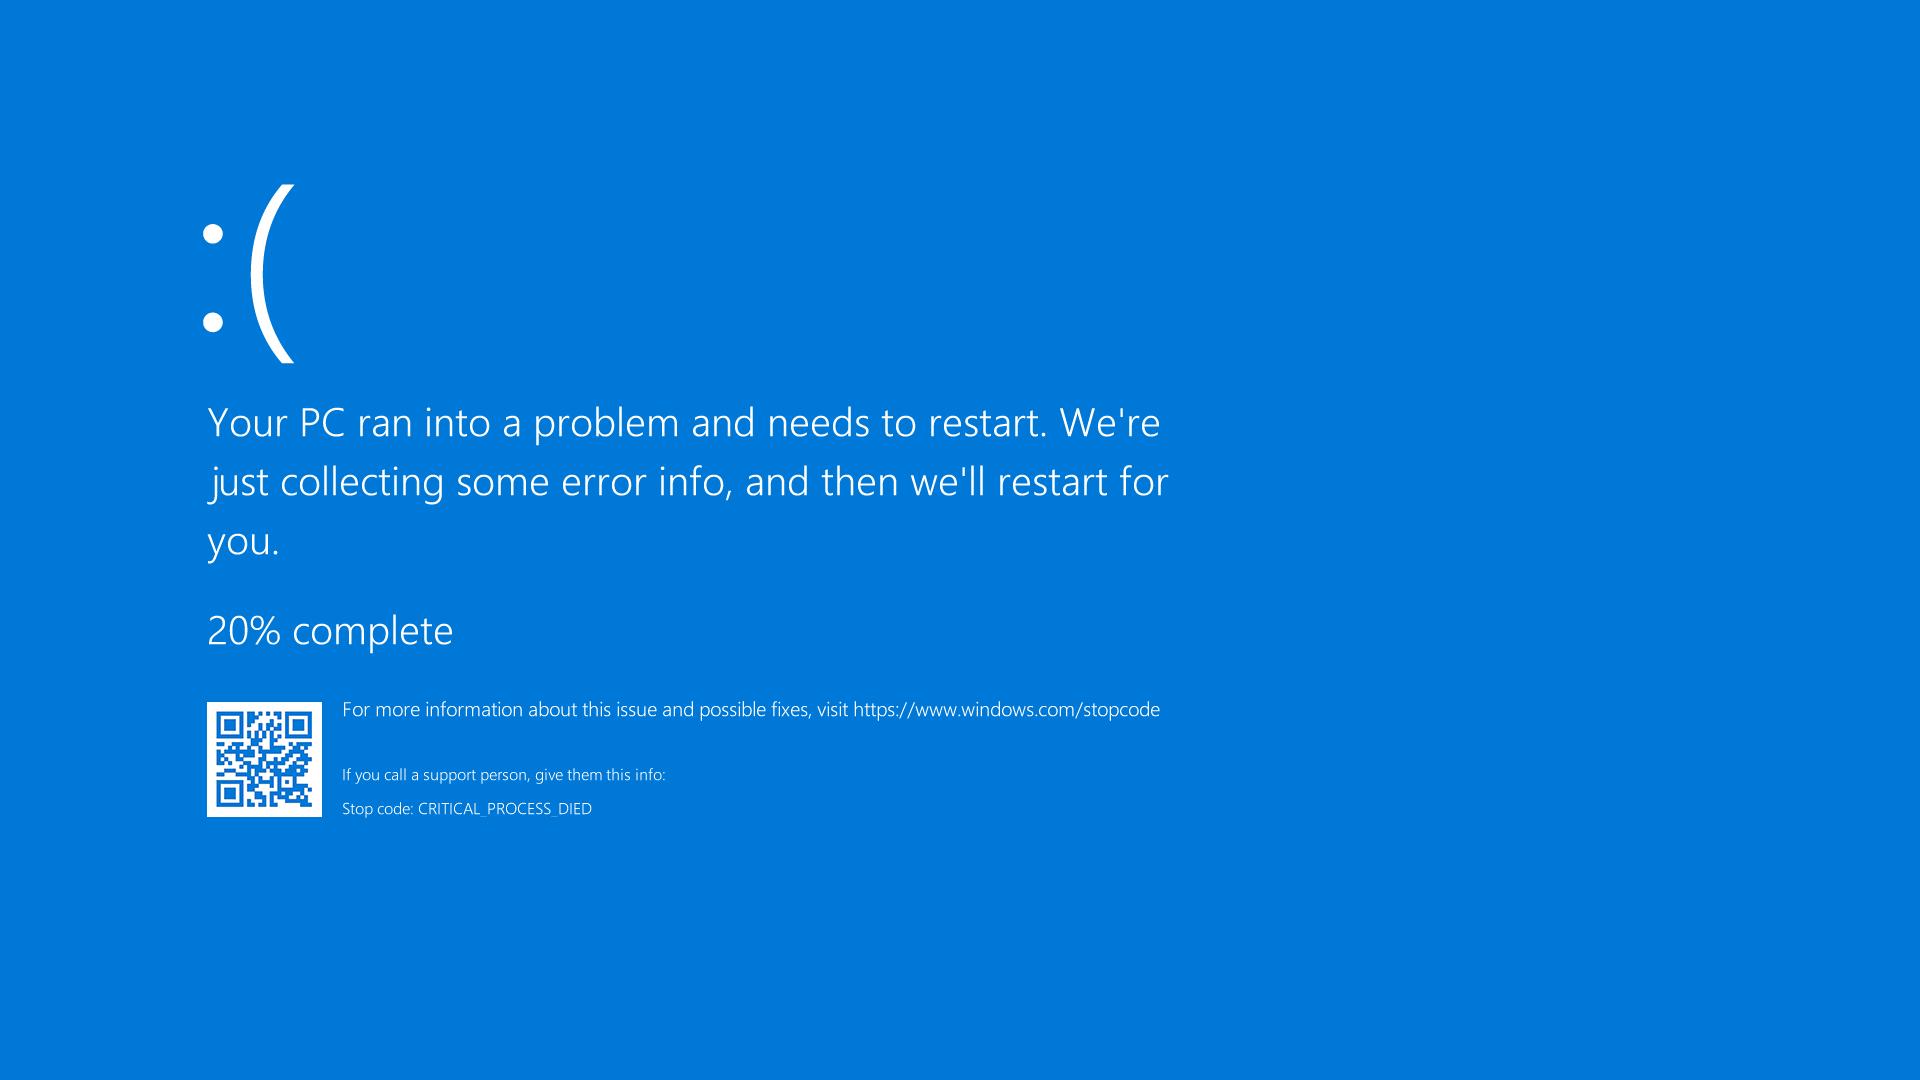 Mengatasi Blue Screen Pada PC Atau Laptop